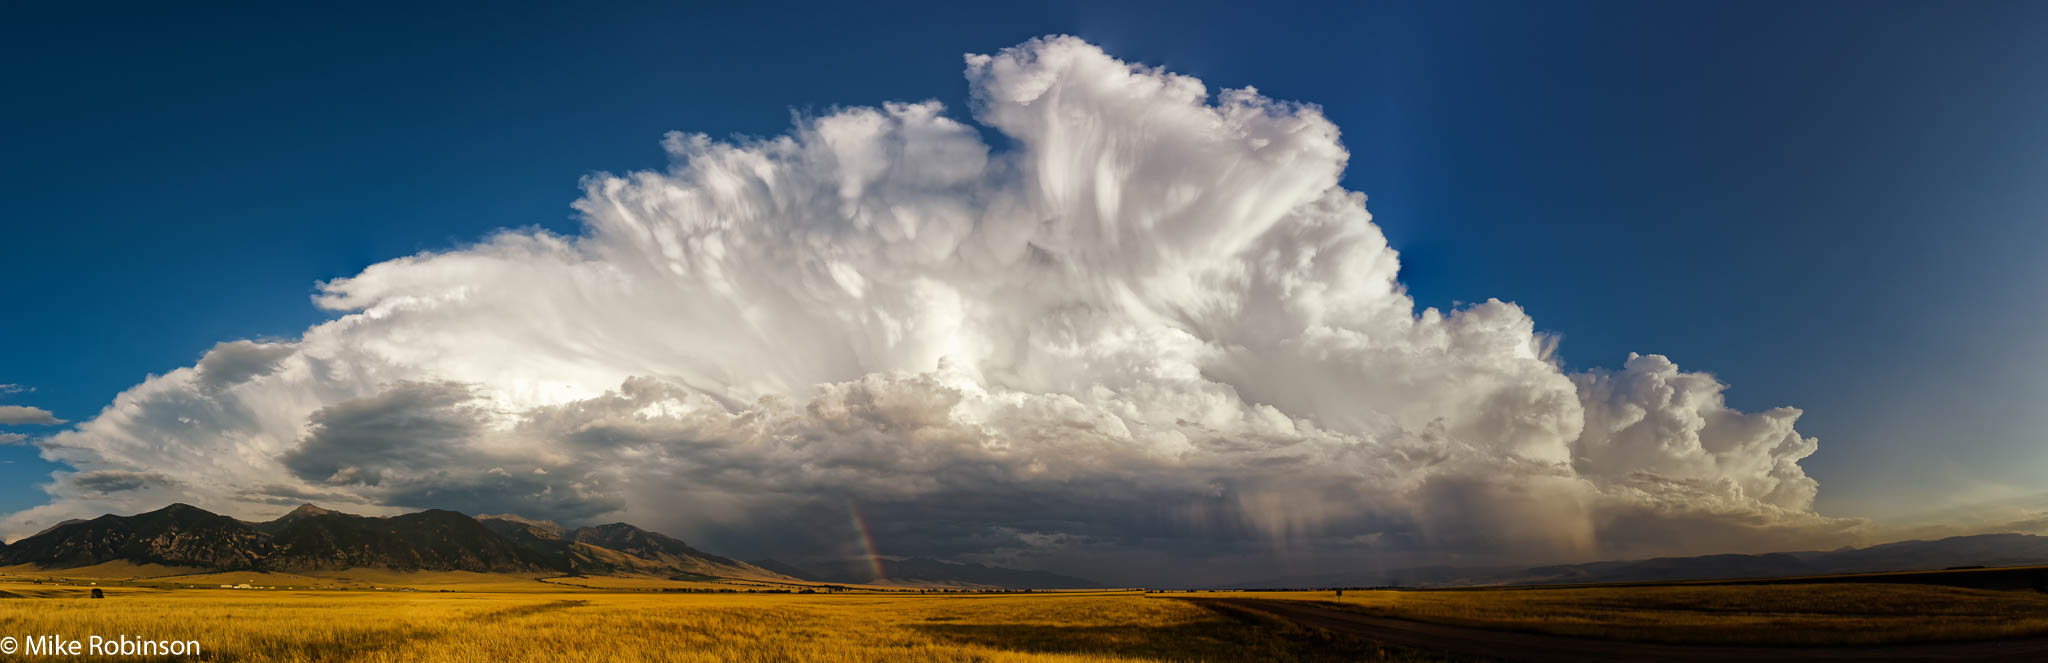 Montana Summer Thunderstorm 3.jpg